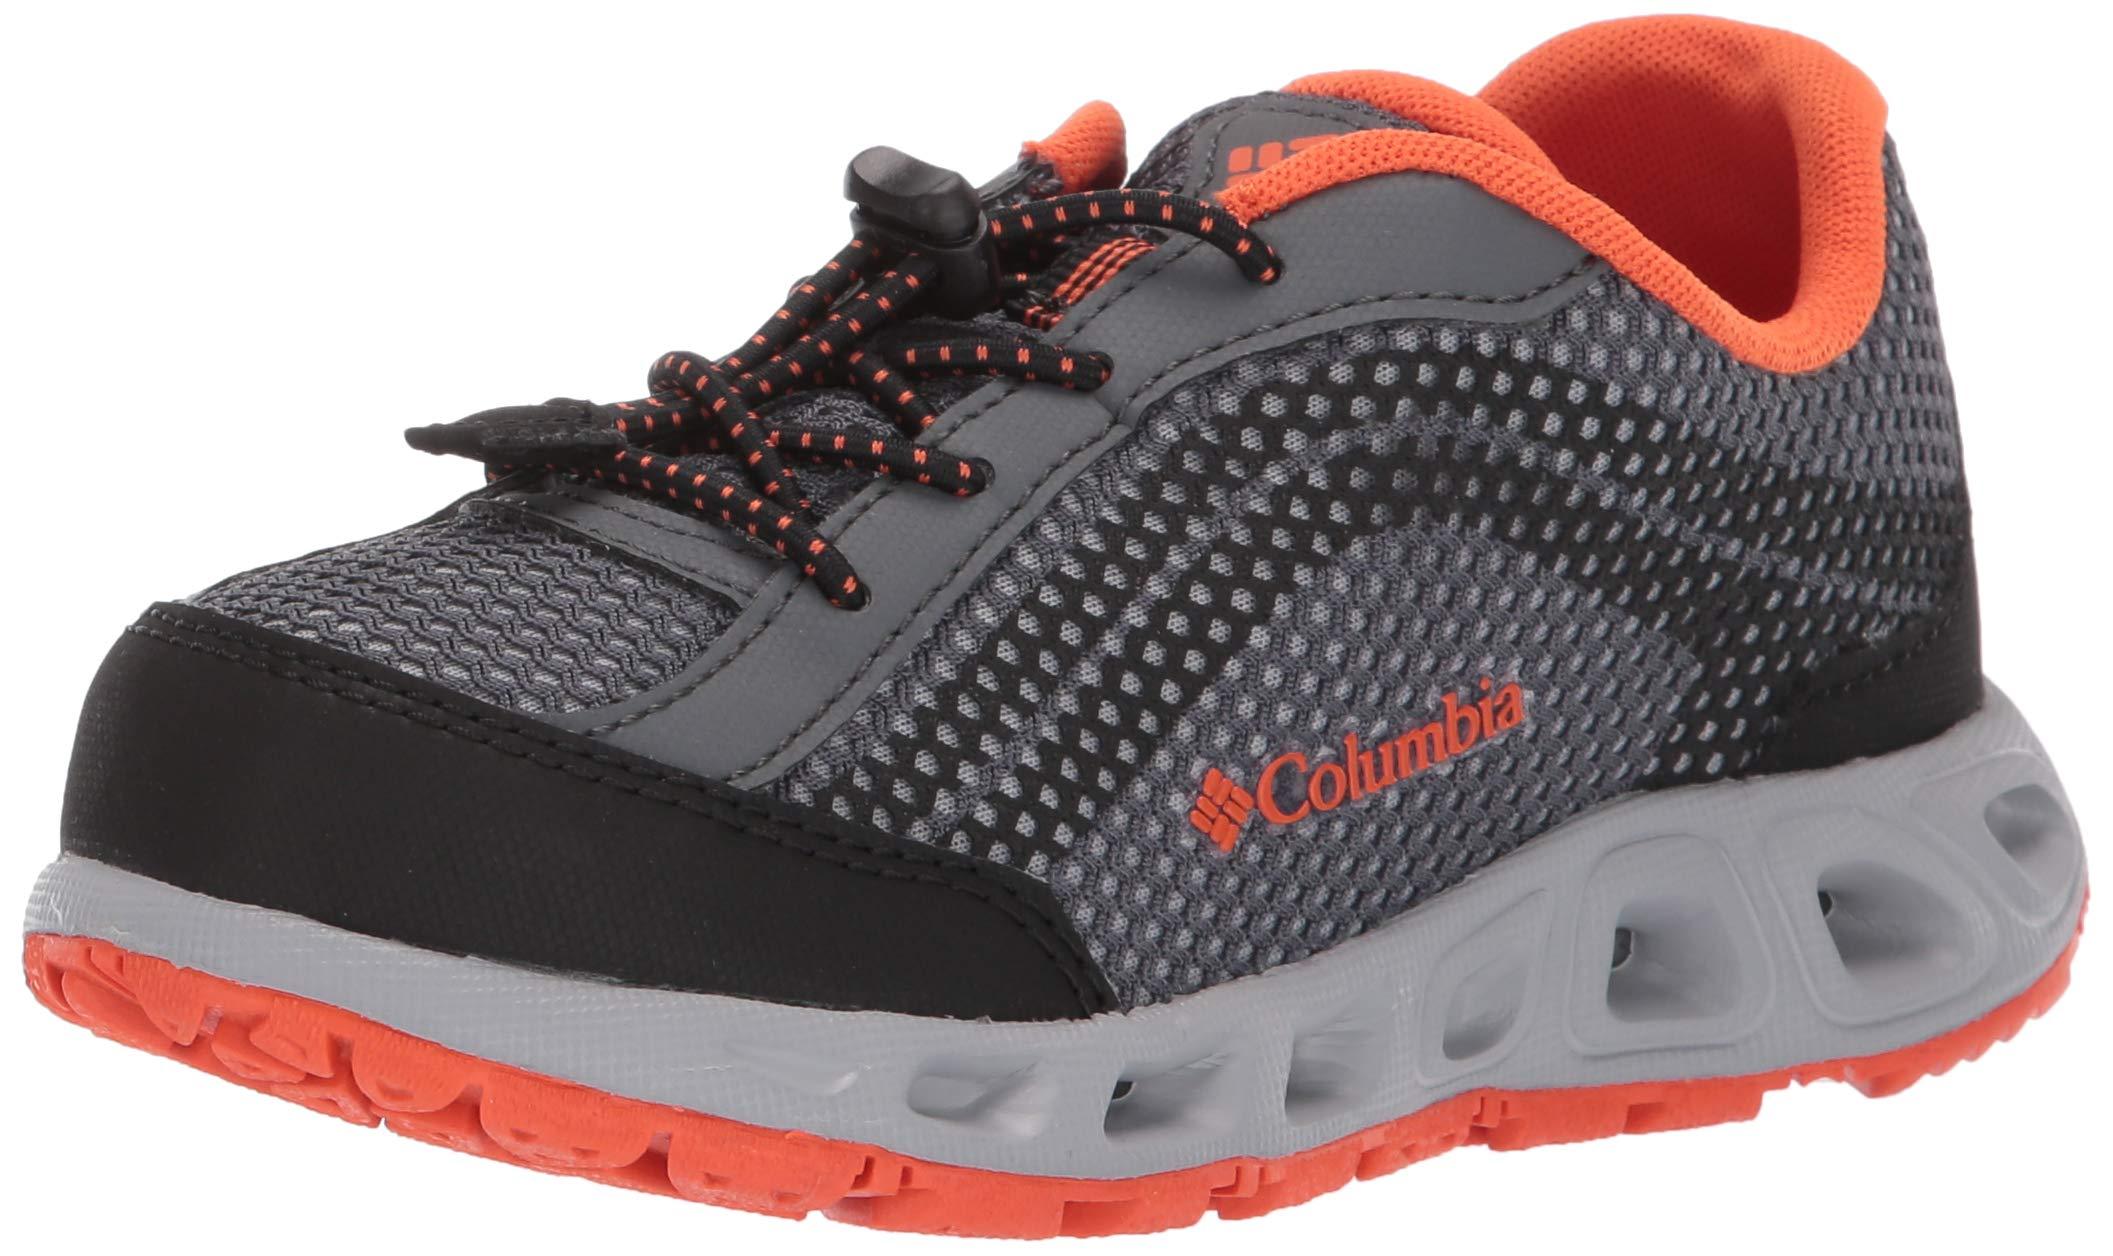 Columbia Unisex Youth Drainmaker IV Water Shoe, Graphite, Tangy Orange, 4 Regular US Big Kid